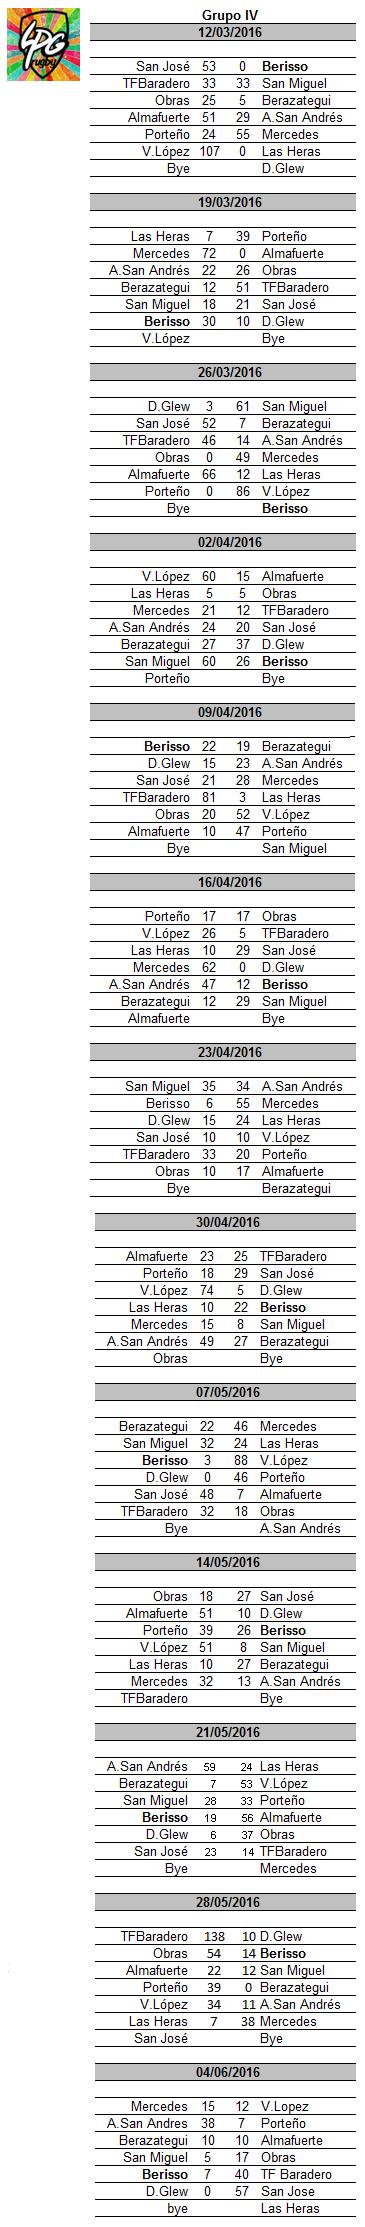 Fixture GIV 2016